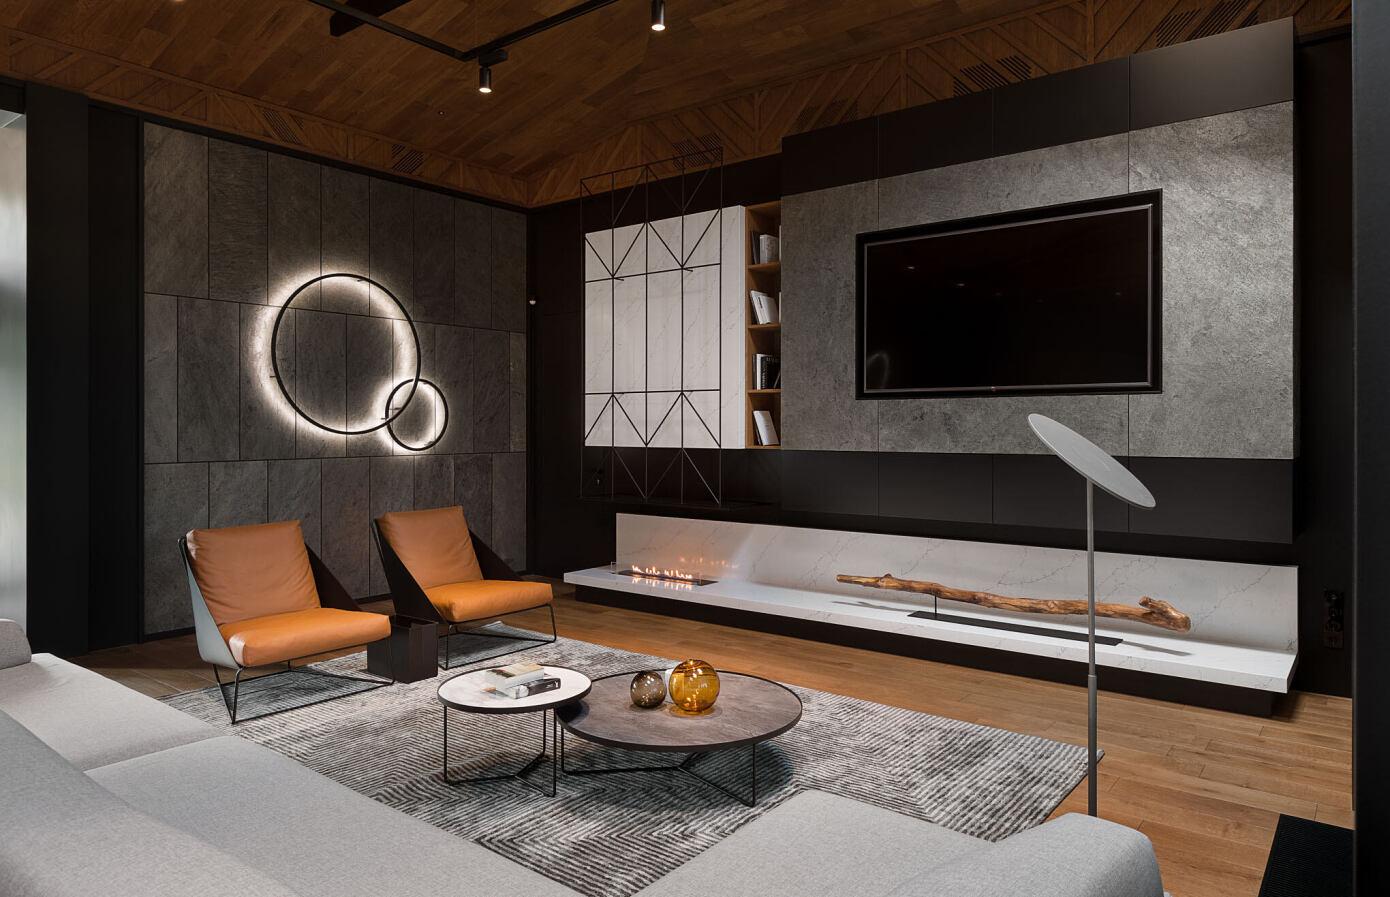 Villa 118 by Denrakaev Unique Ambiance